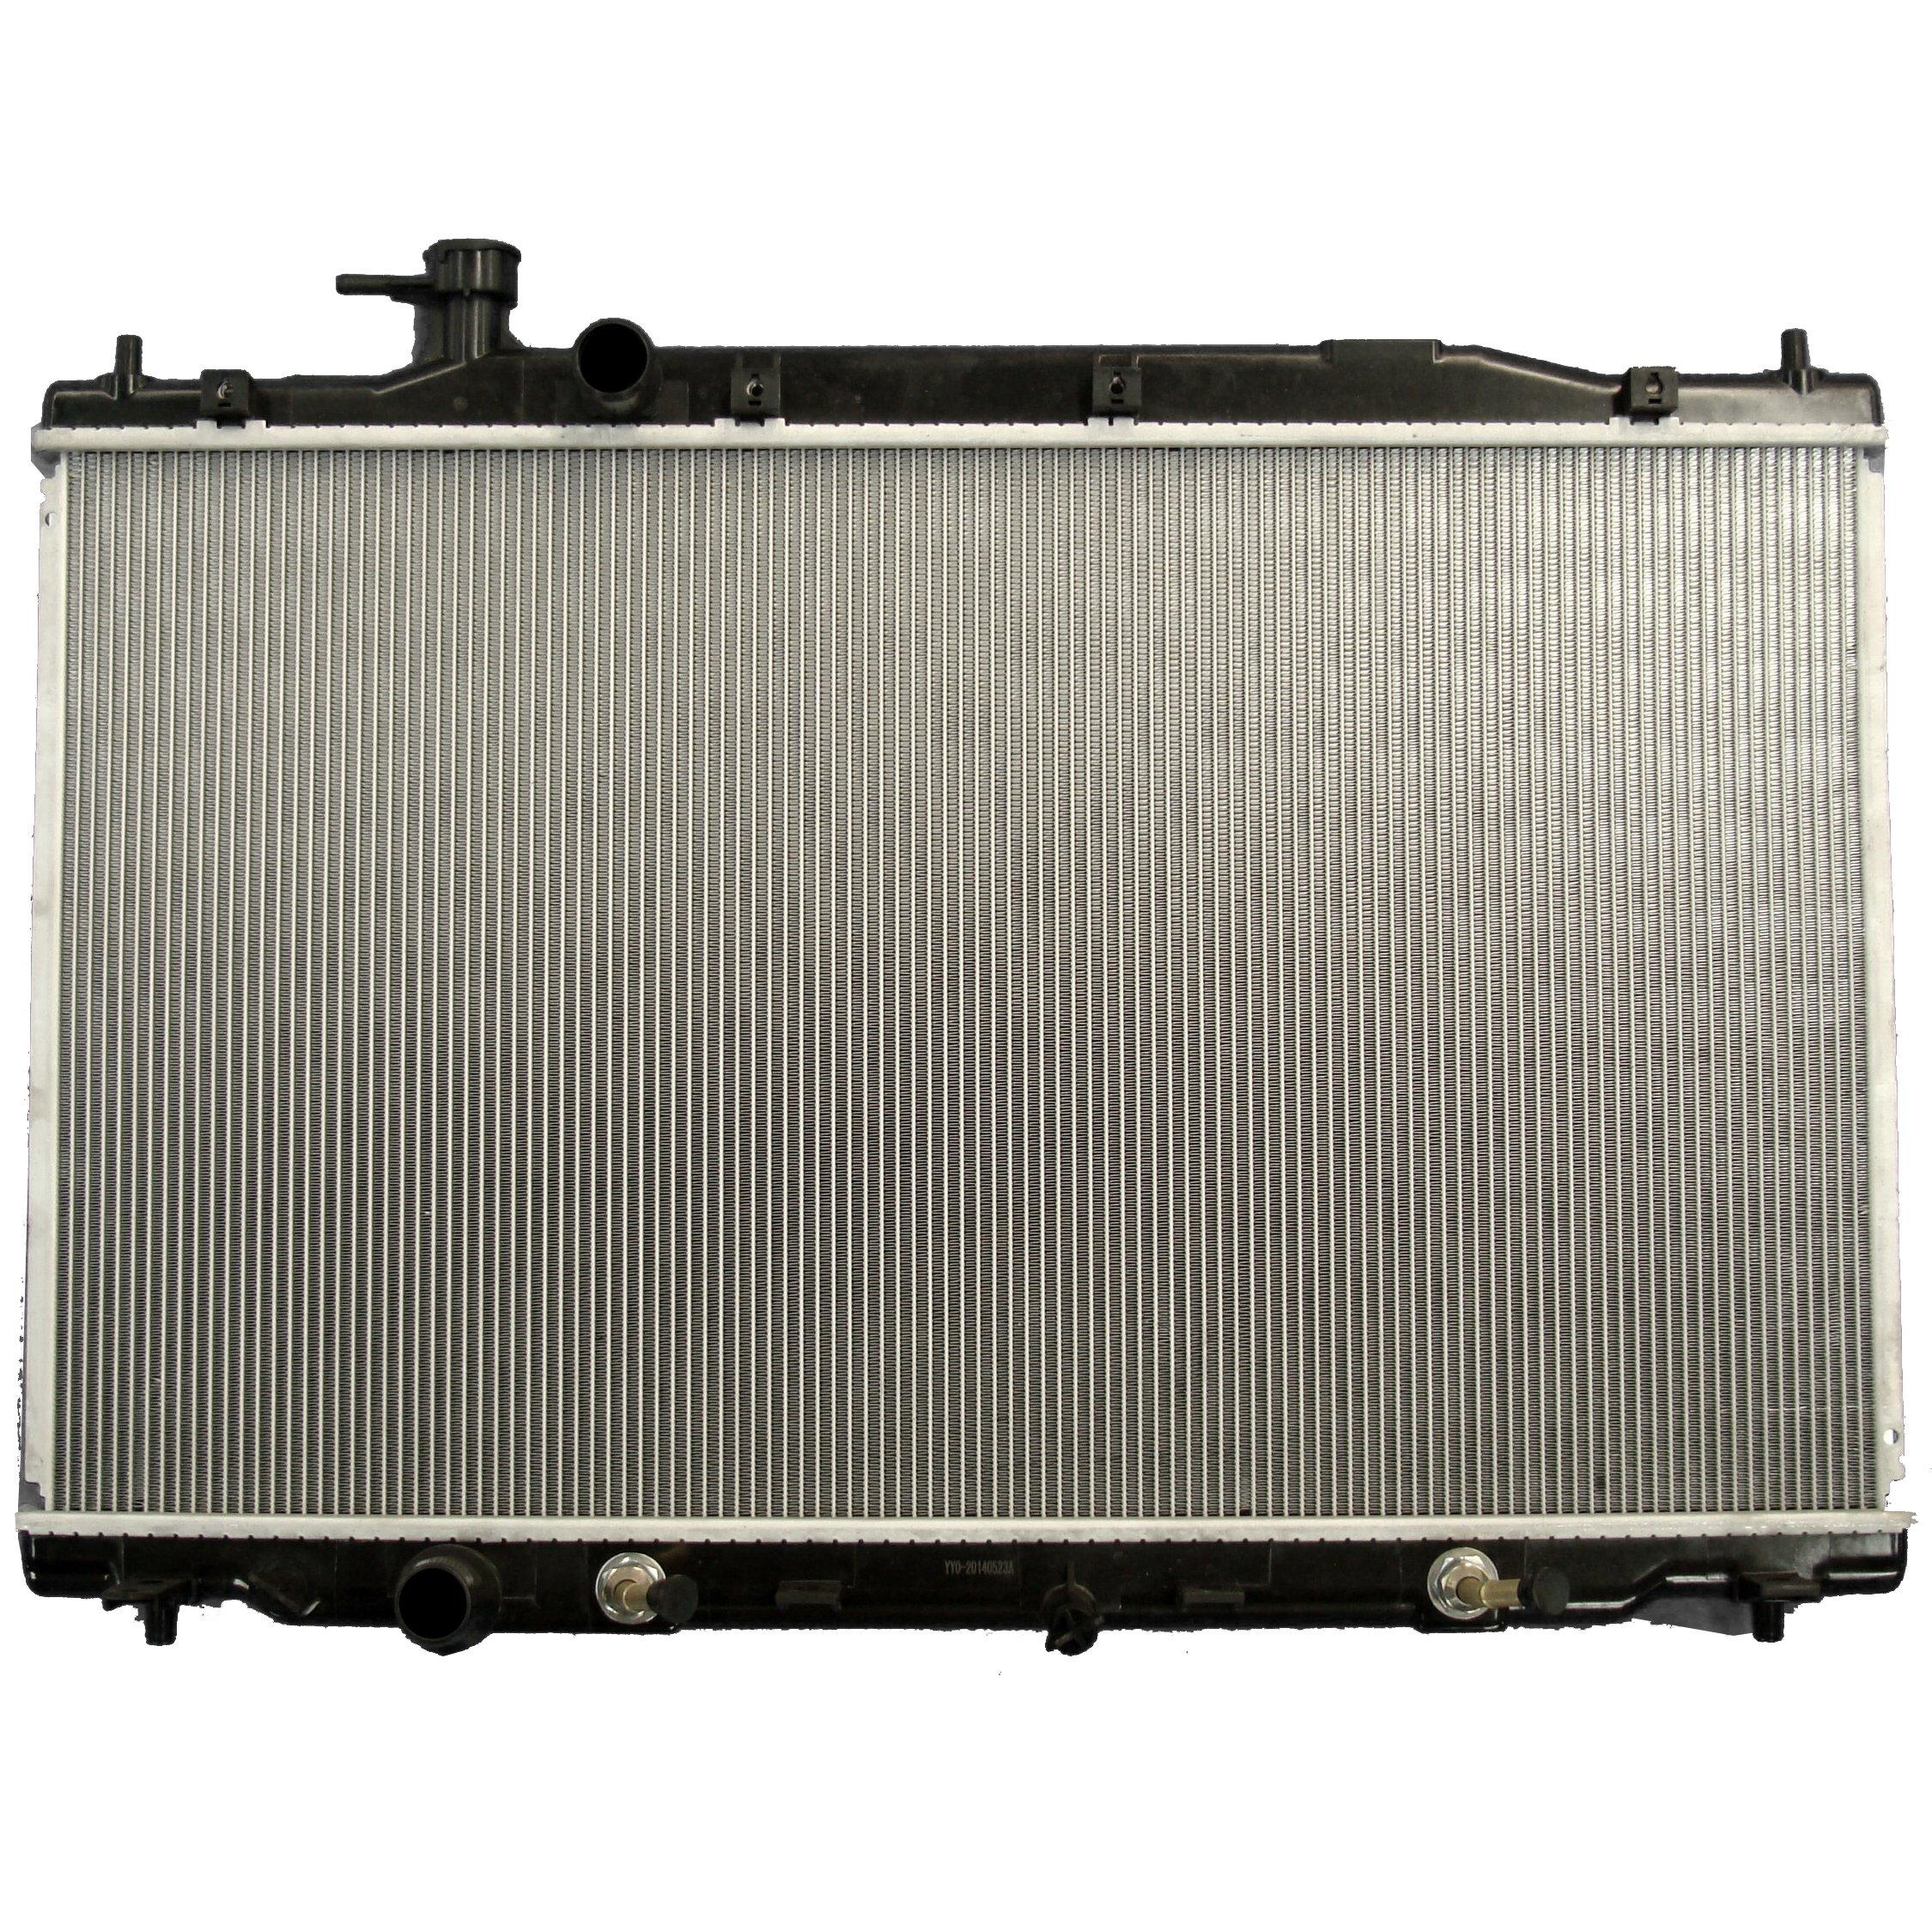 ECCPP Radiator 13155 for 2010-2011 Honda CR-V Sport Utility 4-Door 2.4L